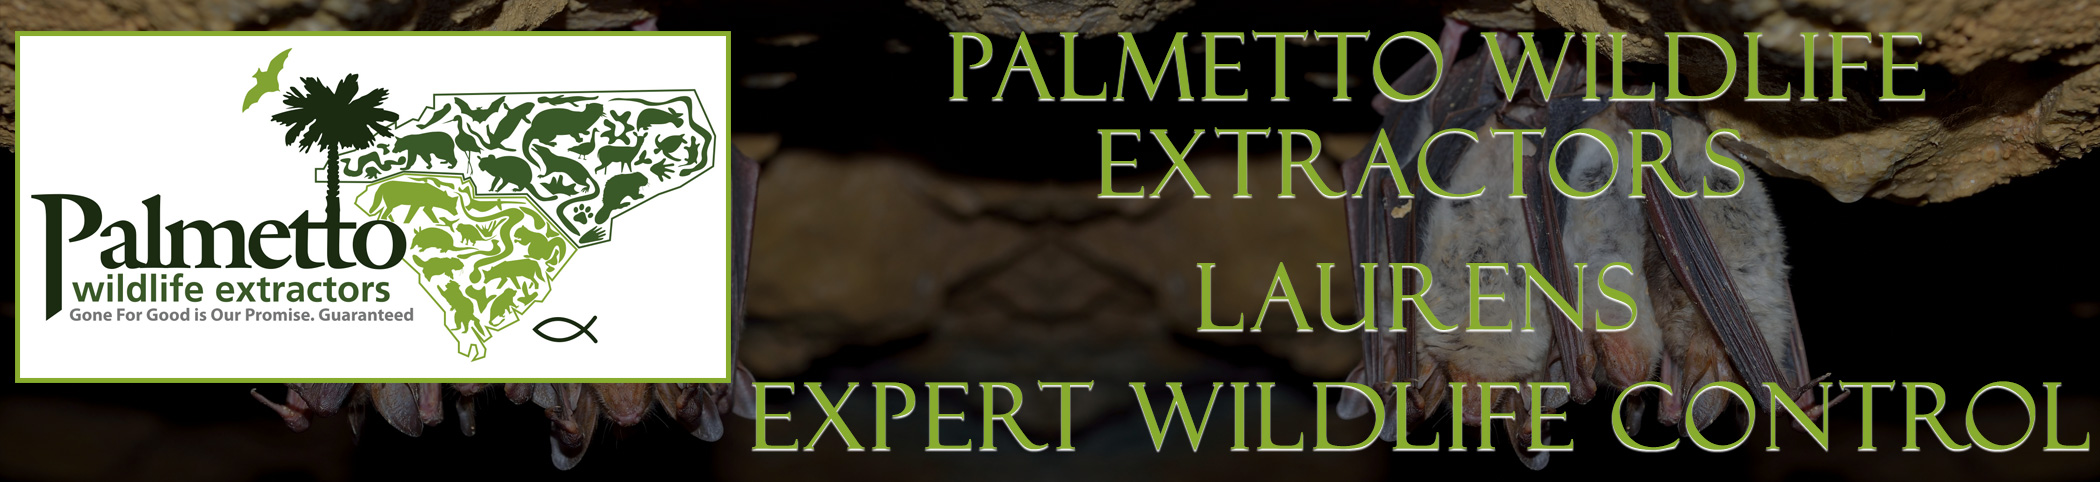 Palmetto Wildlife Extractors Laurens South Carolina header image